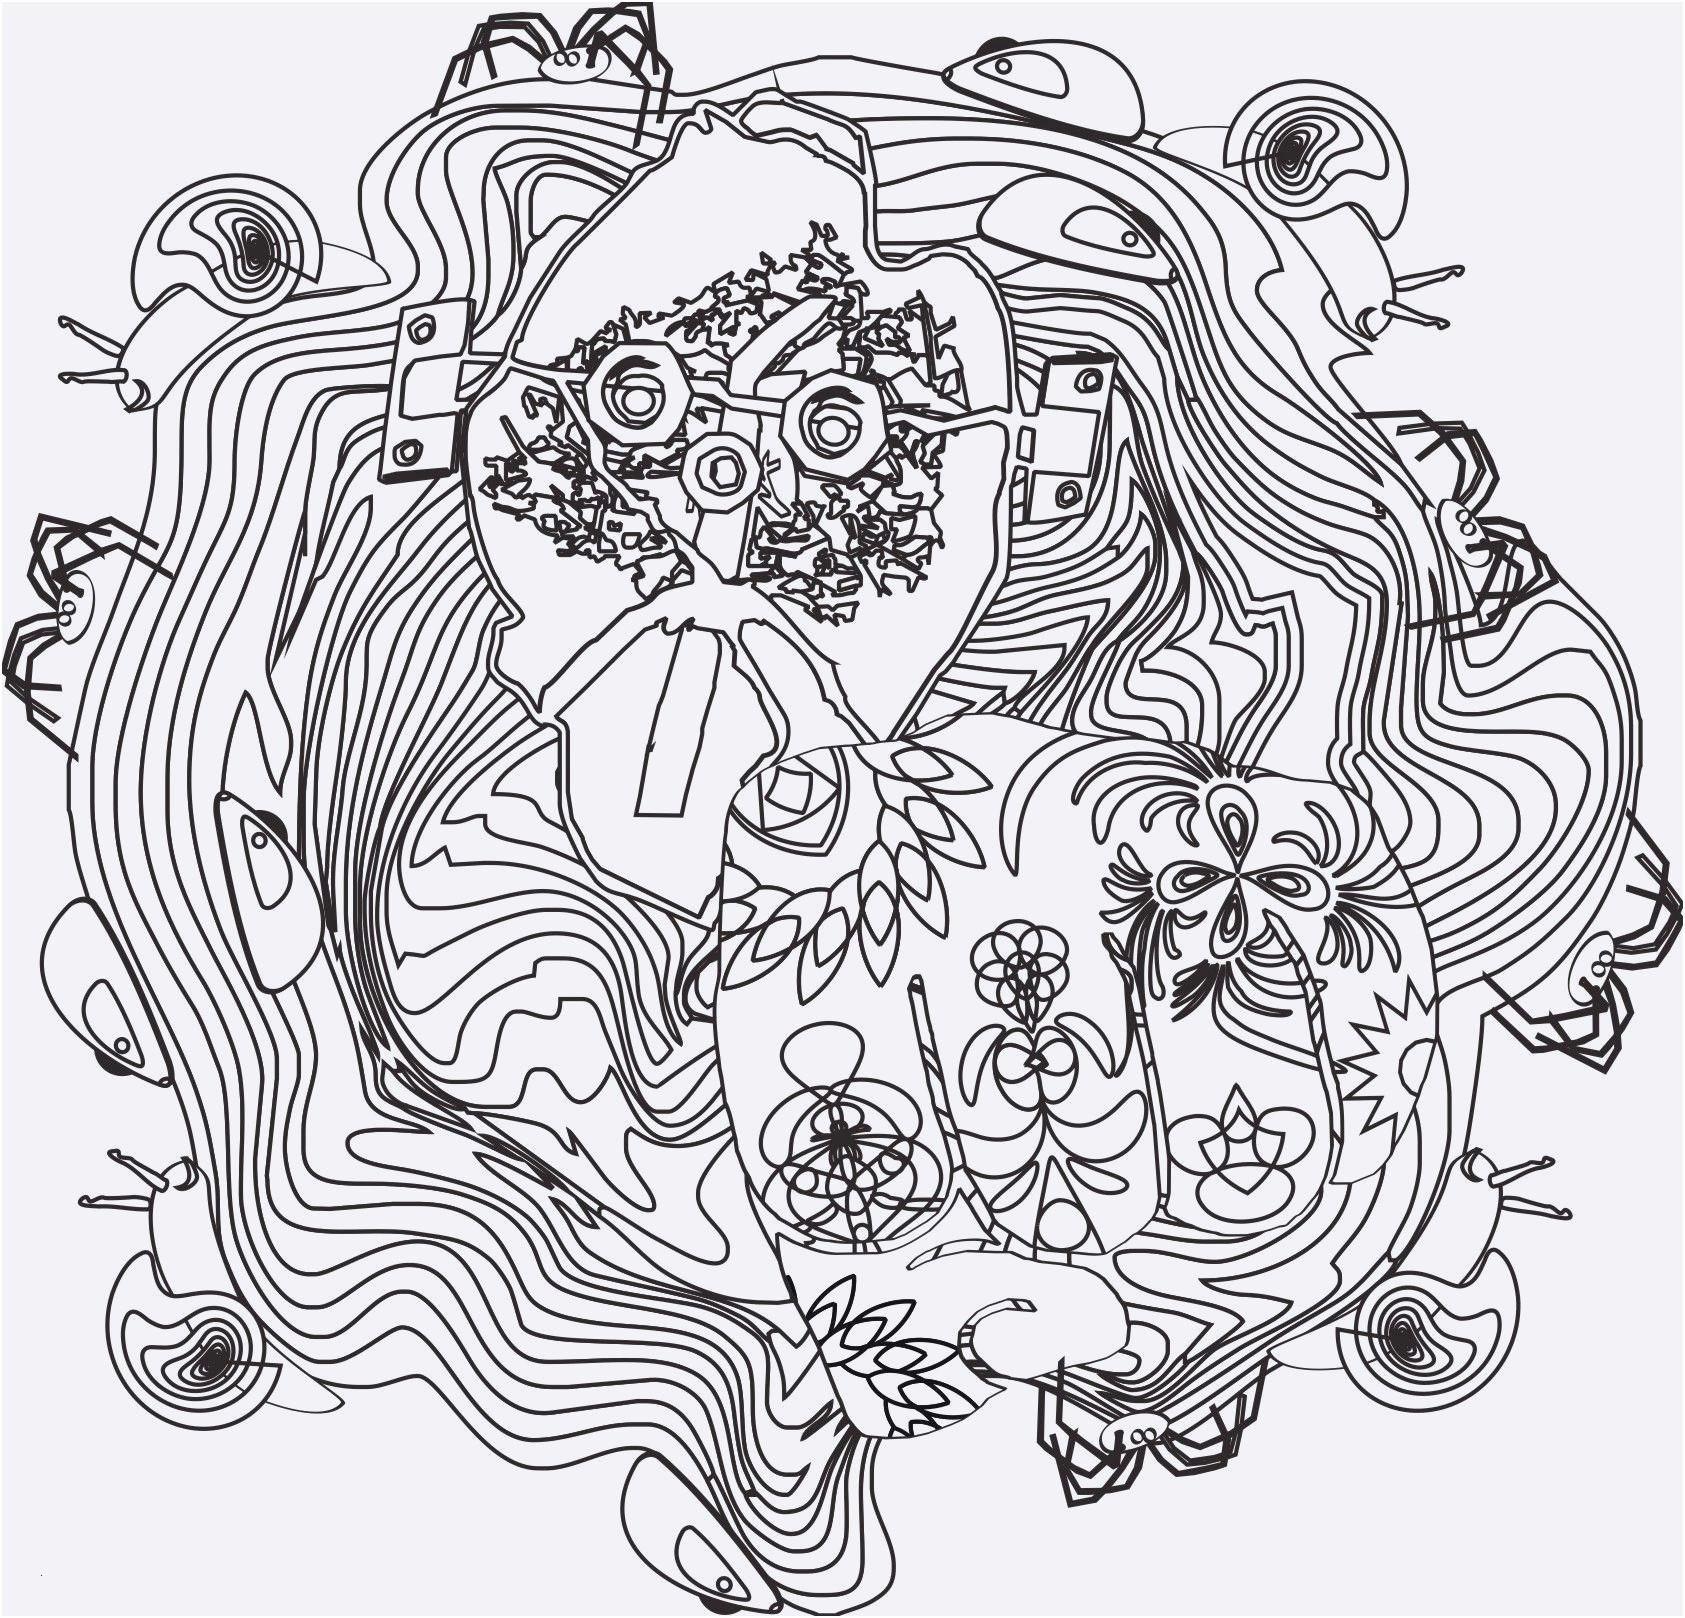 Ausmalbilder Mandala Herzen Genial 40 Mandala Ausmalbilder Scoredatscore Elegant Ausmalbilder Bilder